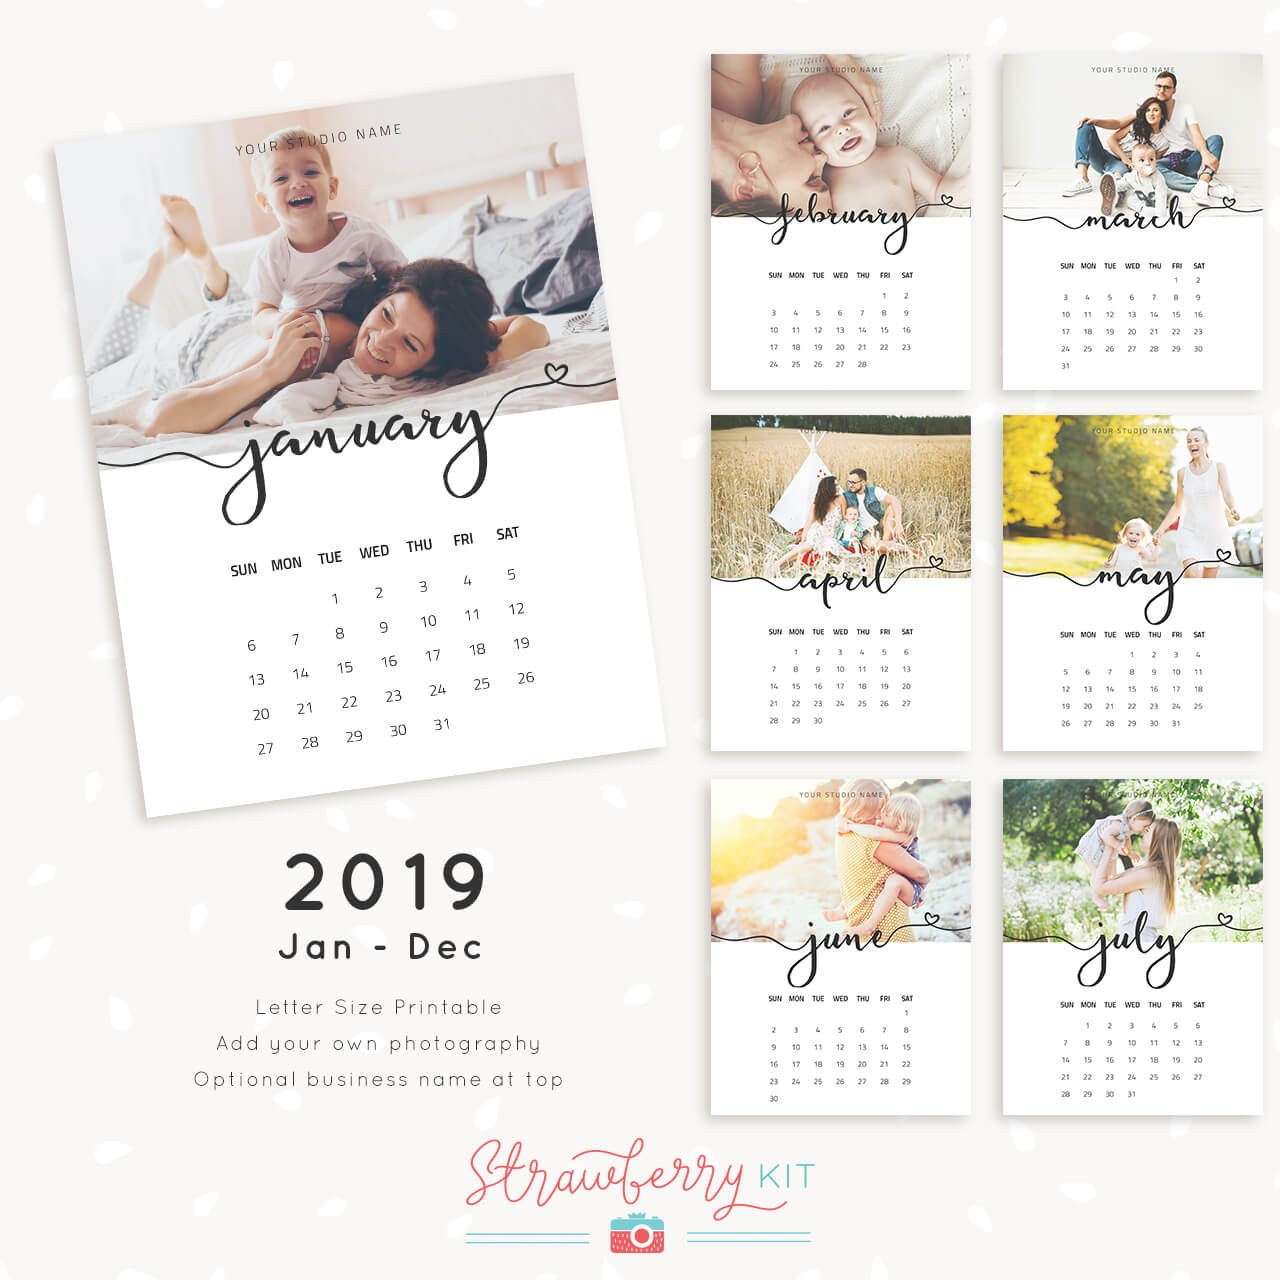 2019 photo calendar template Strawberry Kit